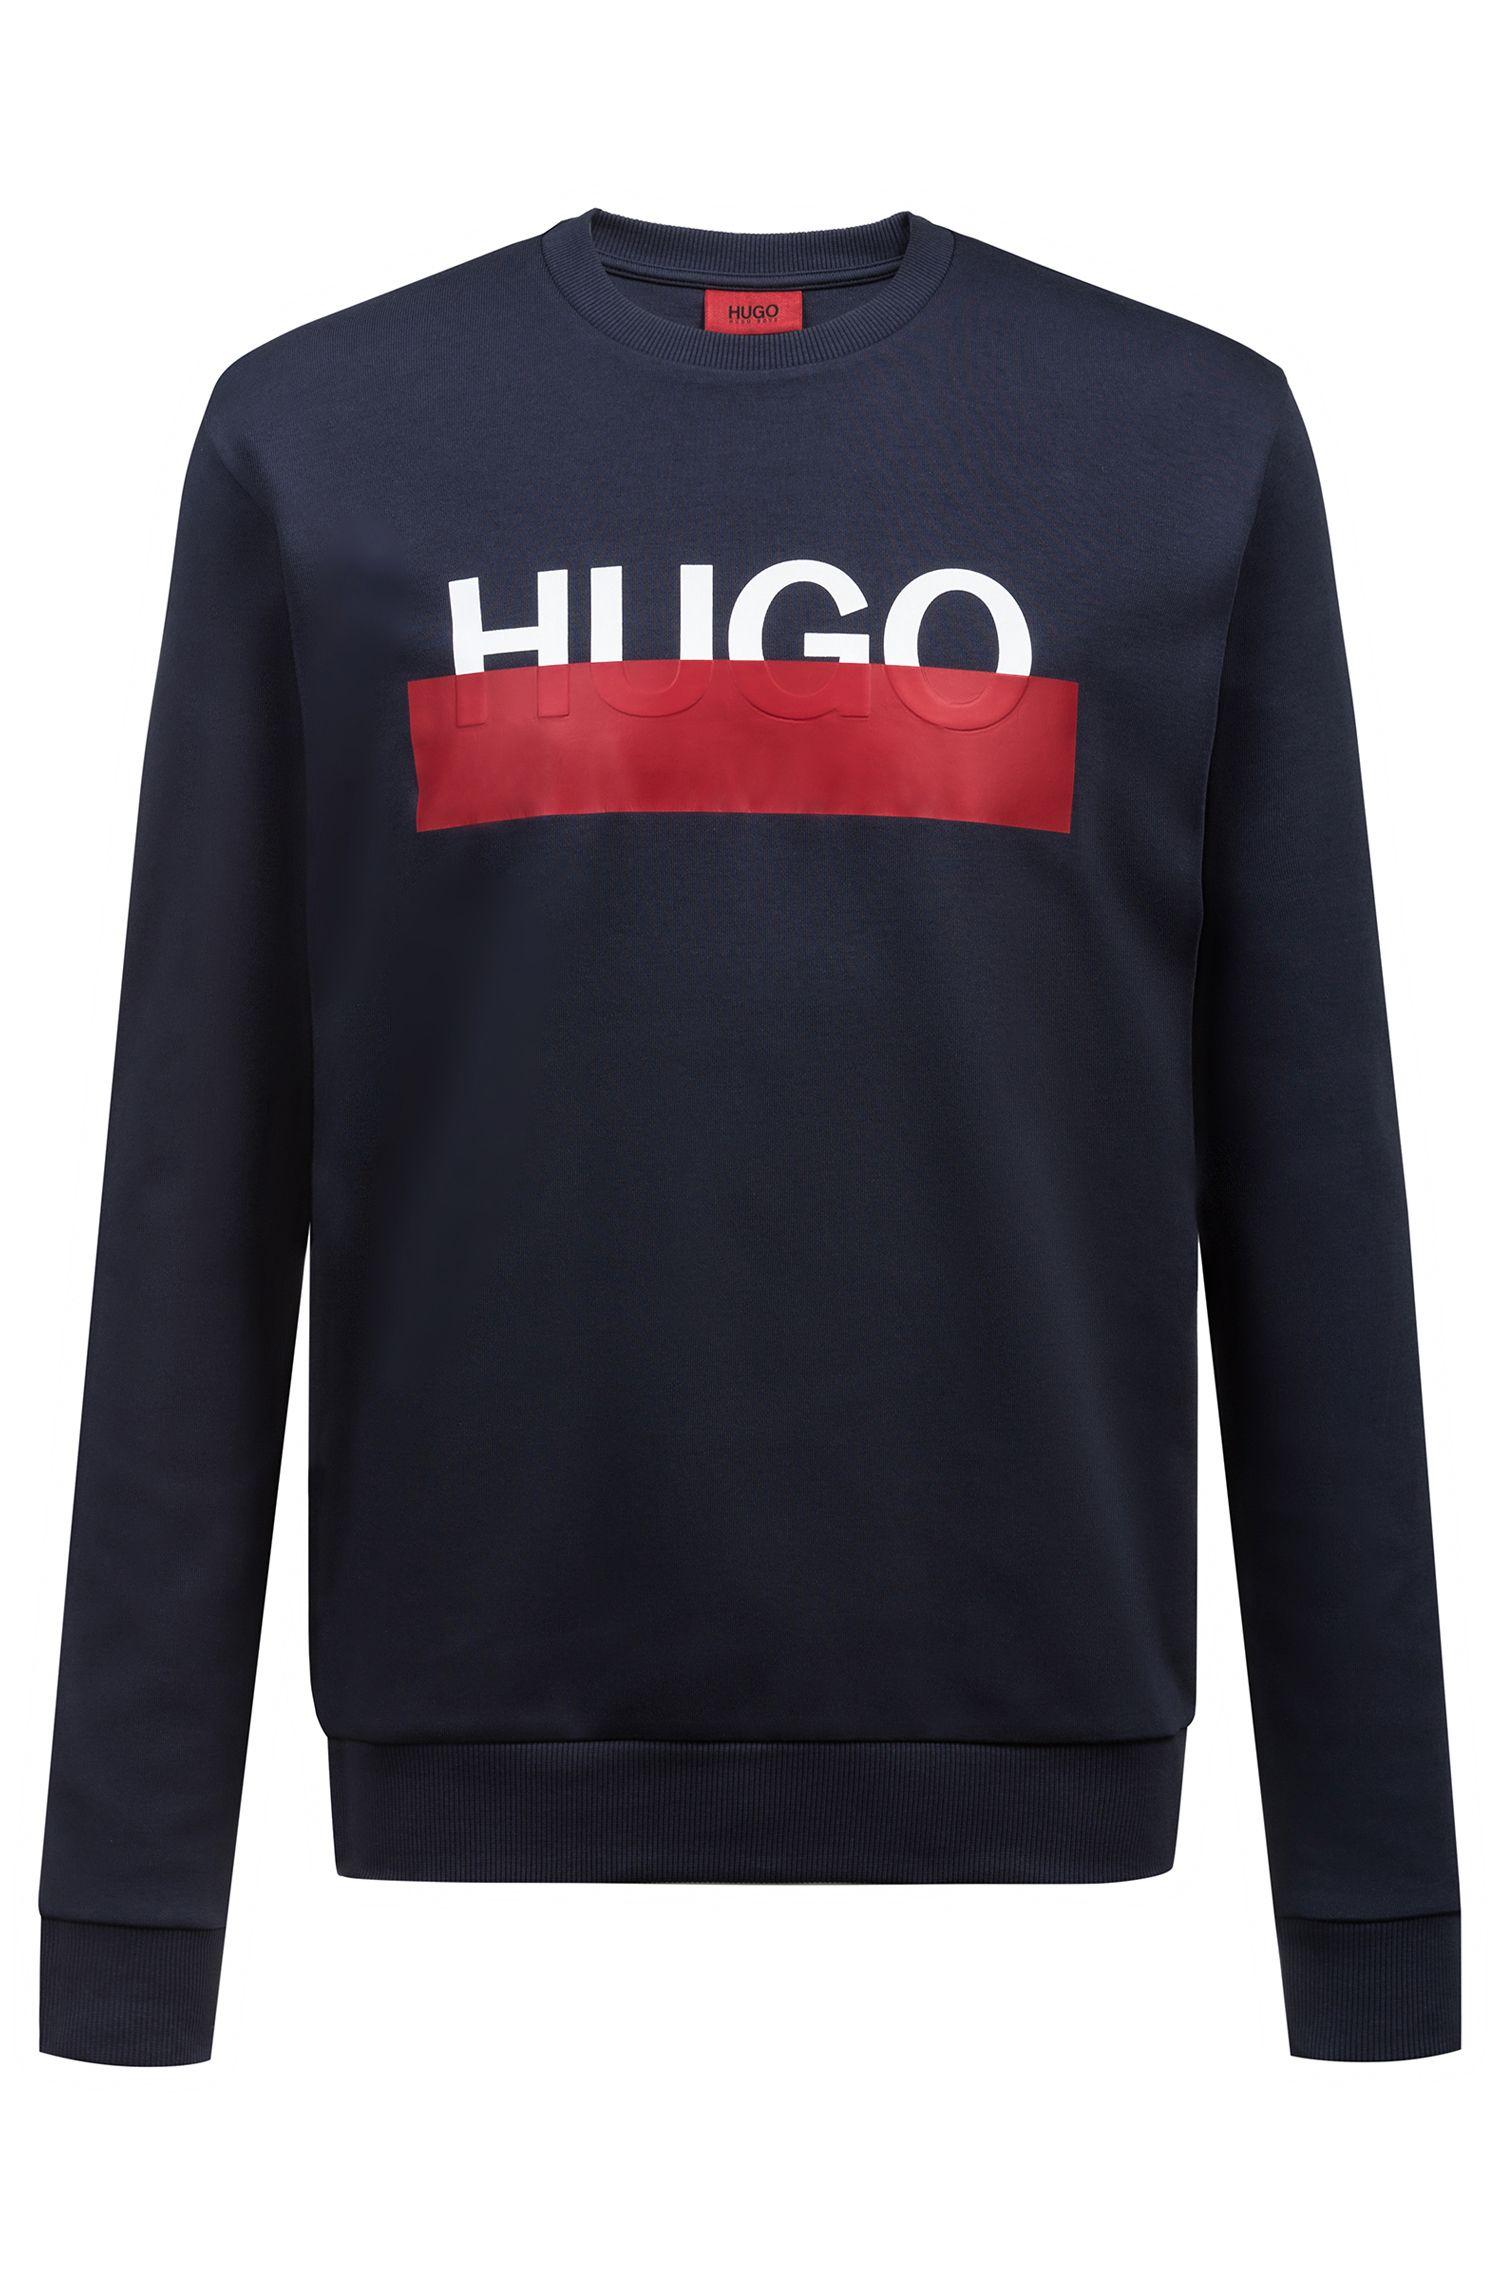 Hugo Boss - Interlock-cotton sweatshirt with partially concealed logo - 1